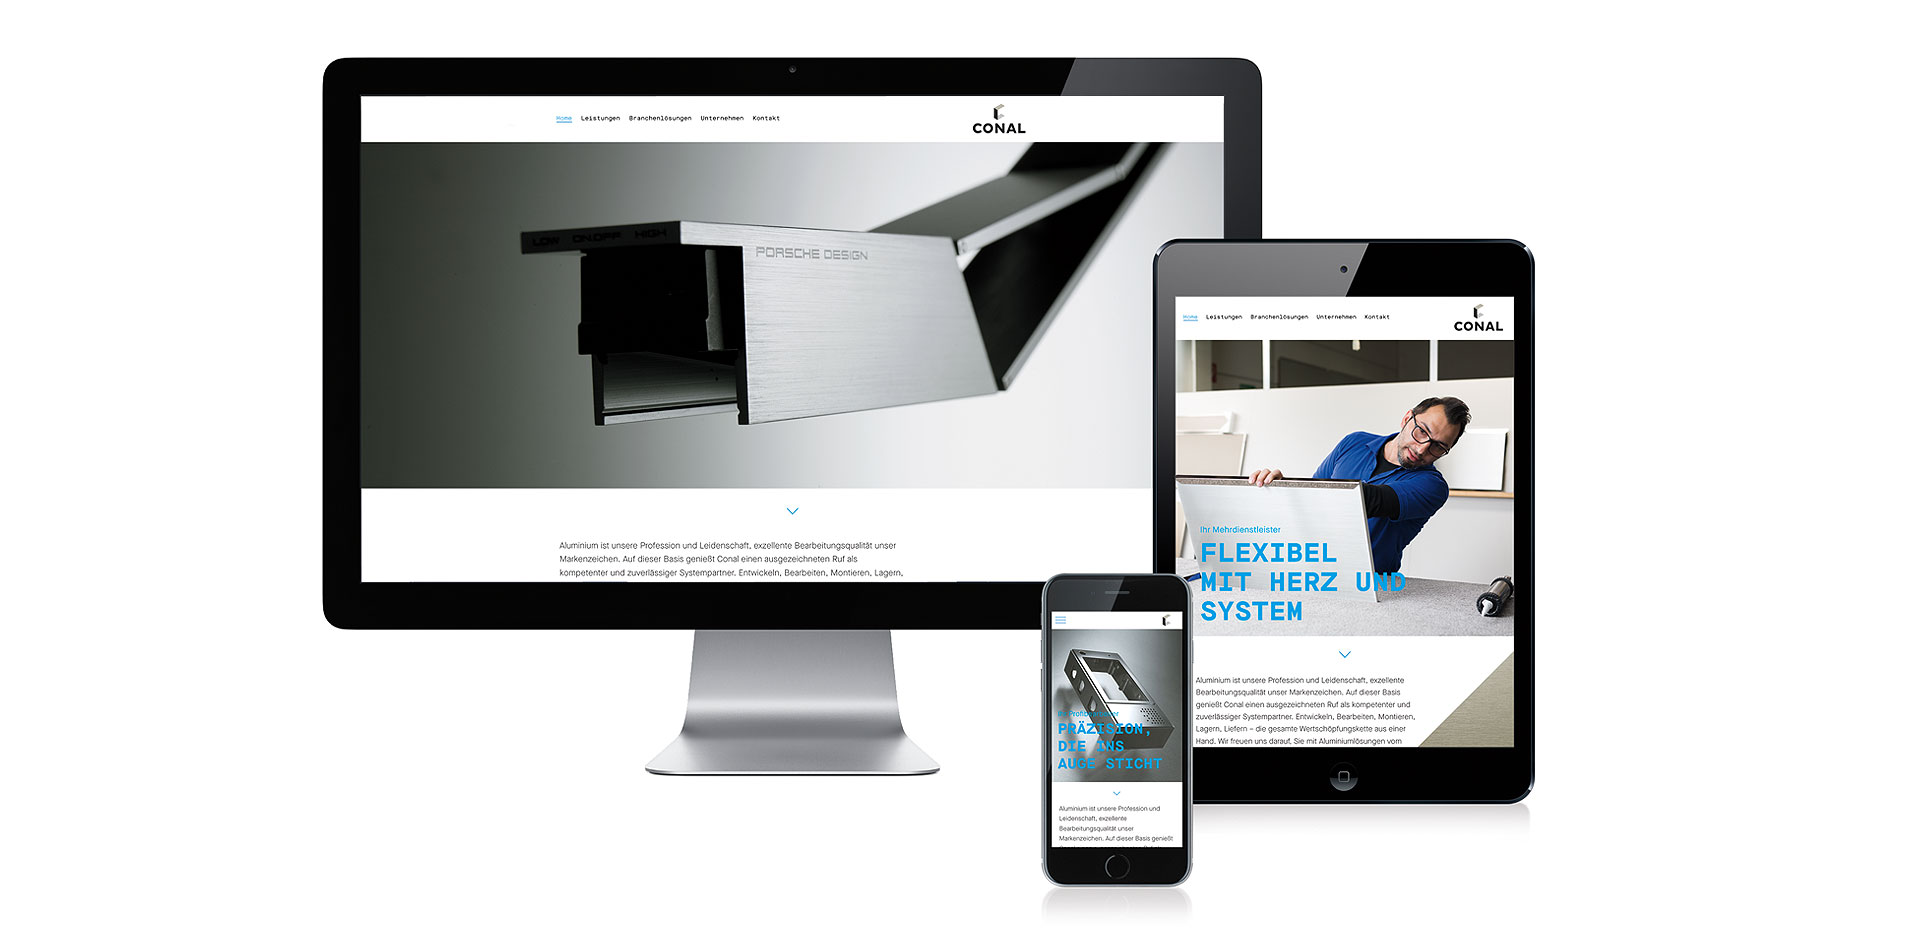 conal corporate design 08